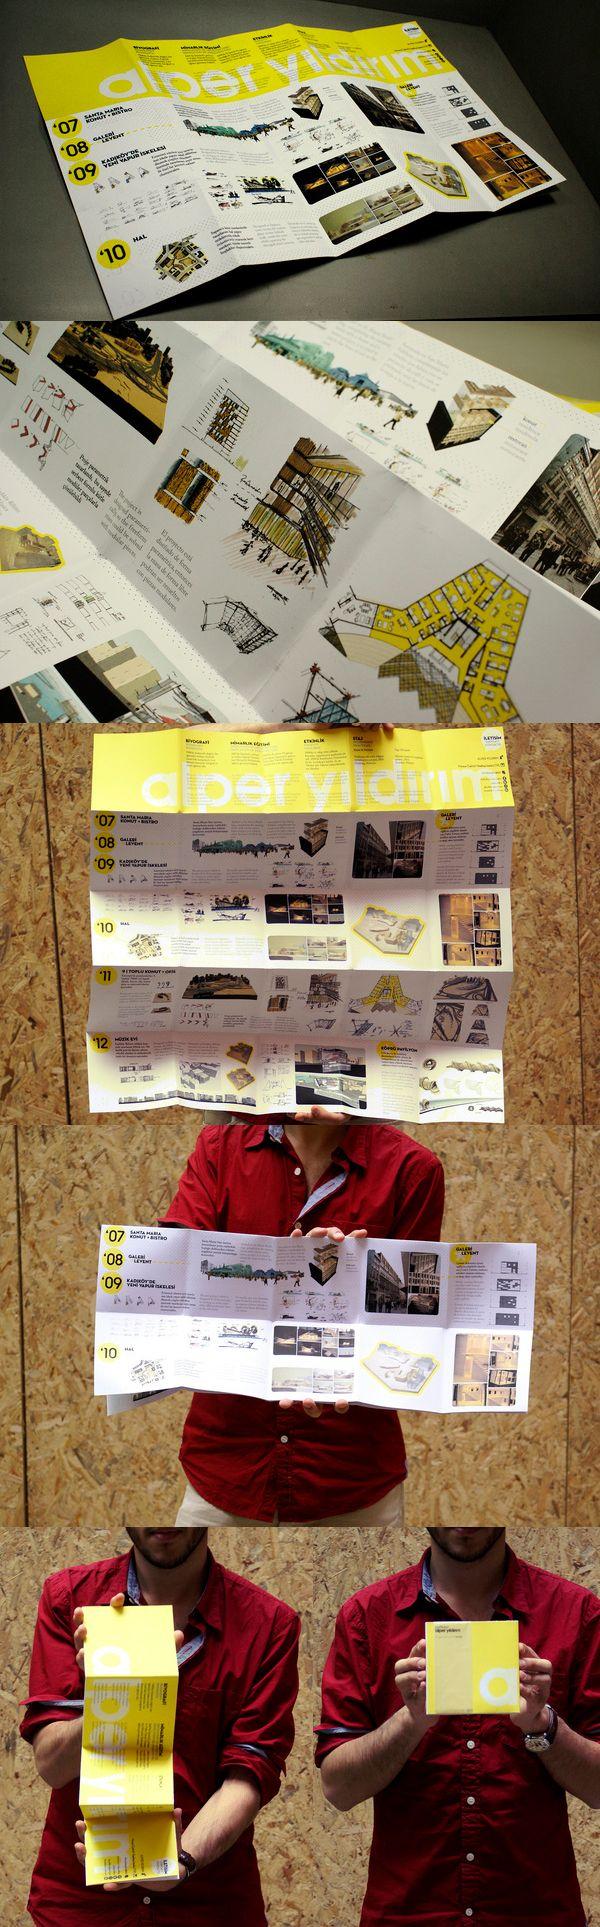 Printed Graphic Design Portfolio Example - Alper Yildirim i really love the folded aspect of this portfolio!